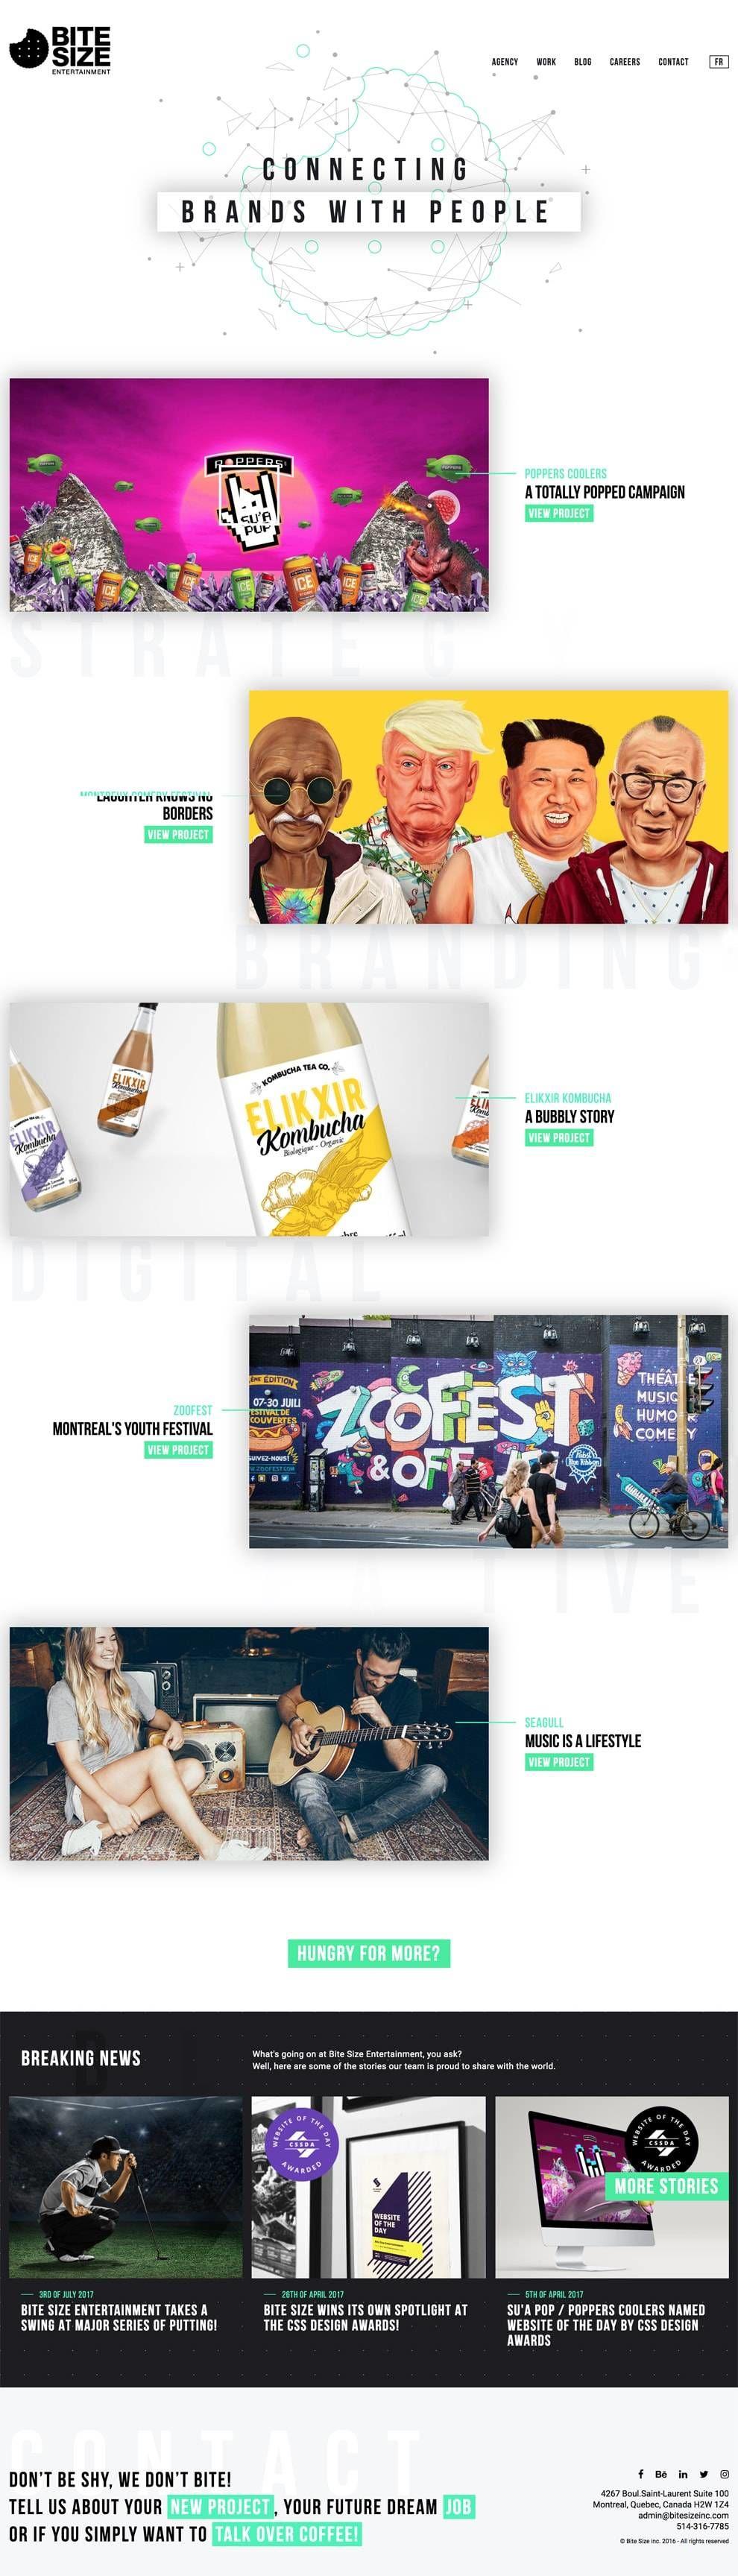 Bite Size Entertainment Great Website Design Homepage